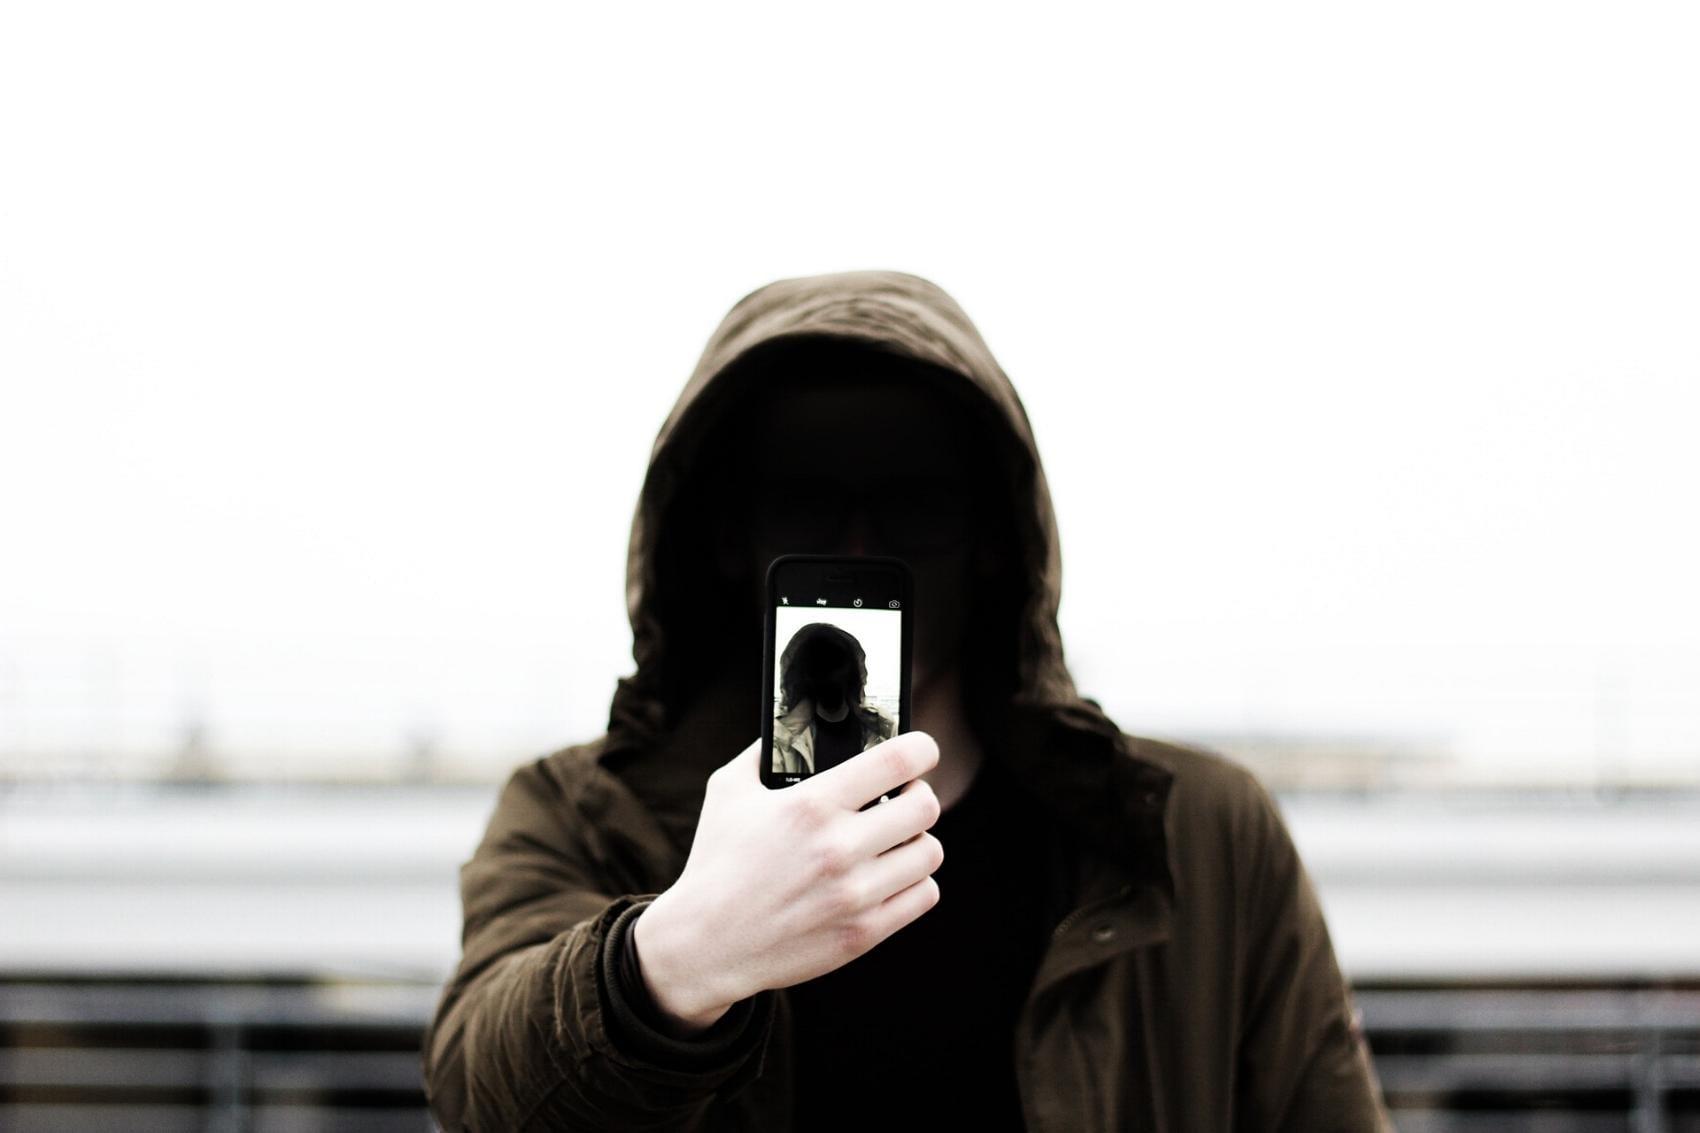 Telefon Selfie